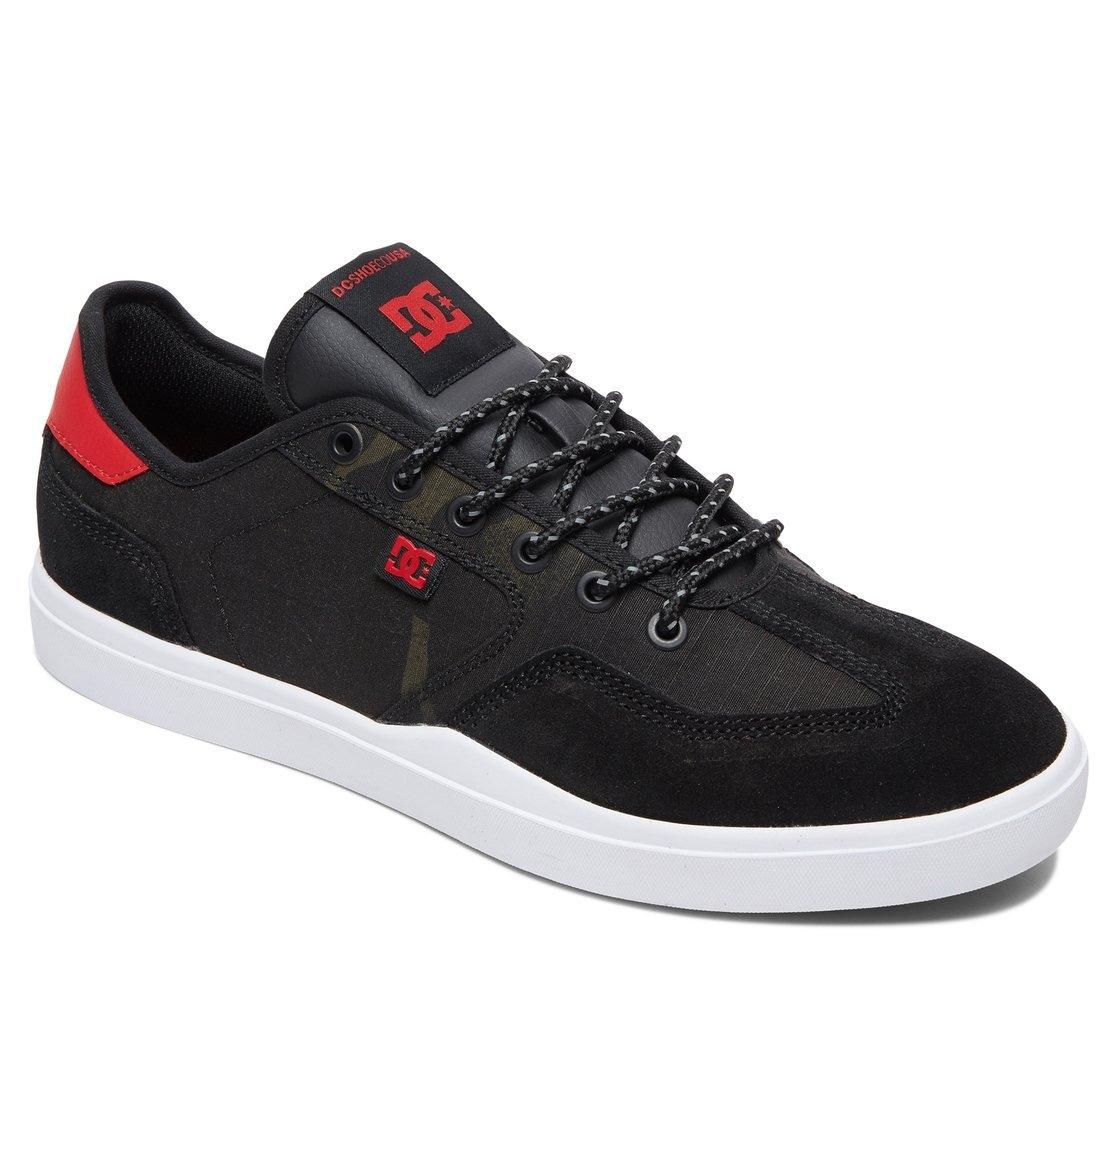 Schoenenvestrey Shoppen Dc Online Shoes Se 1cTF3lKJ